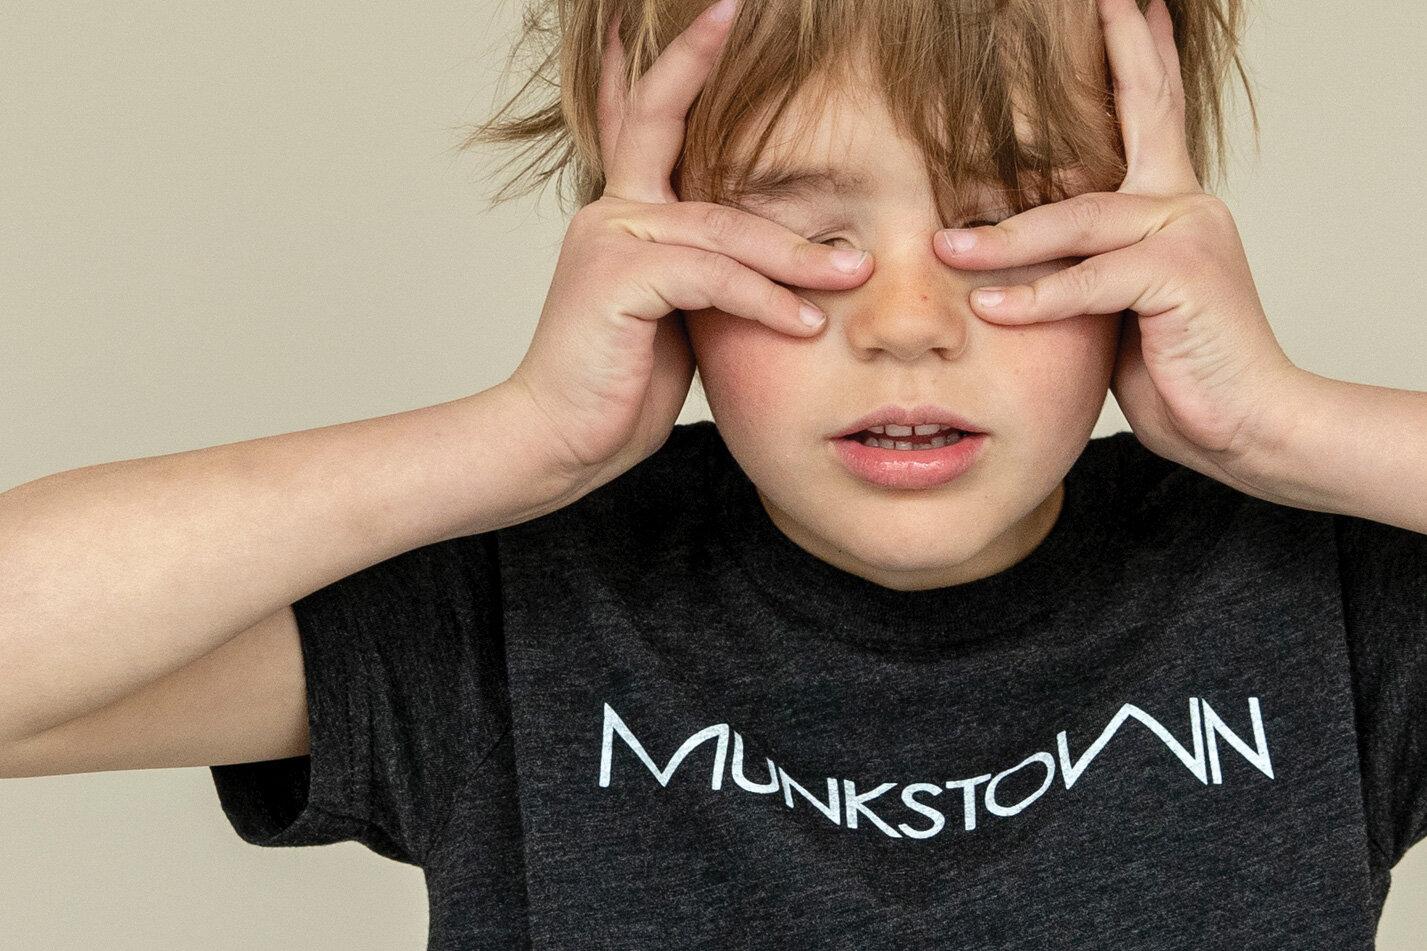 munkstown_9.jpg